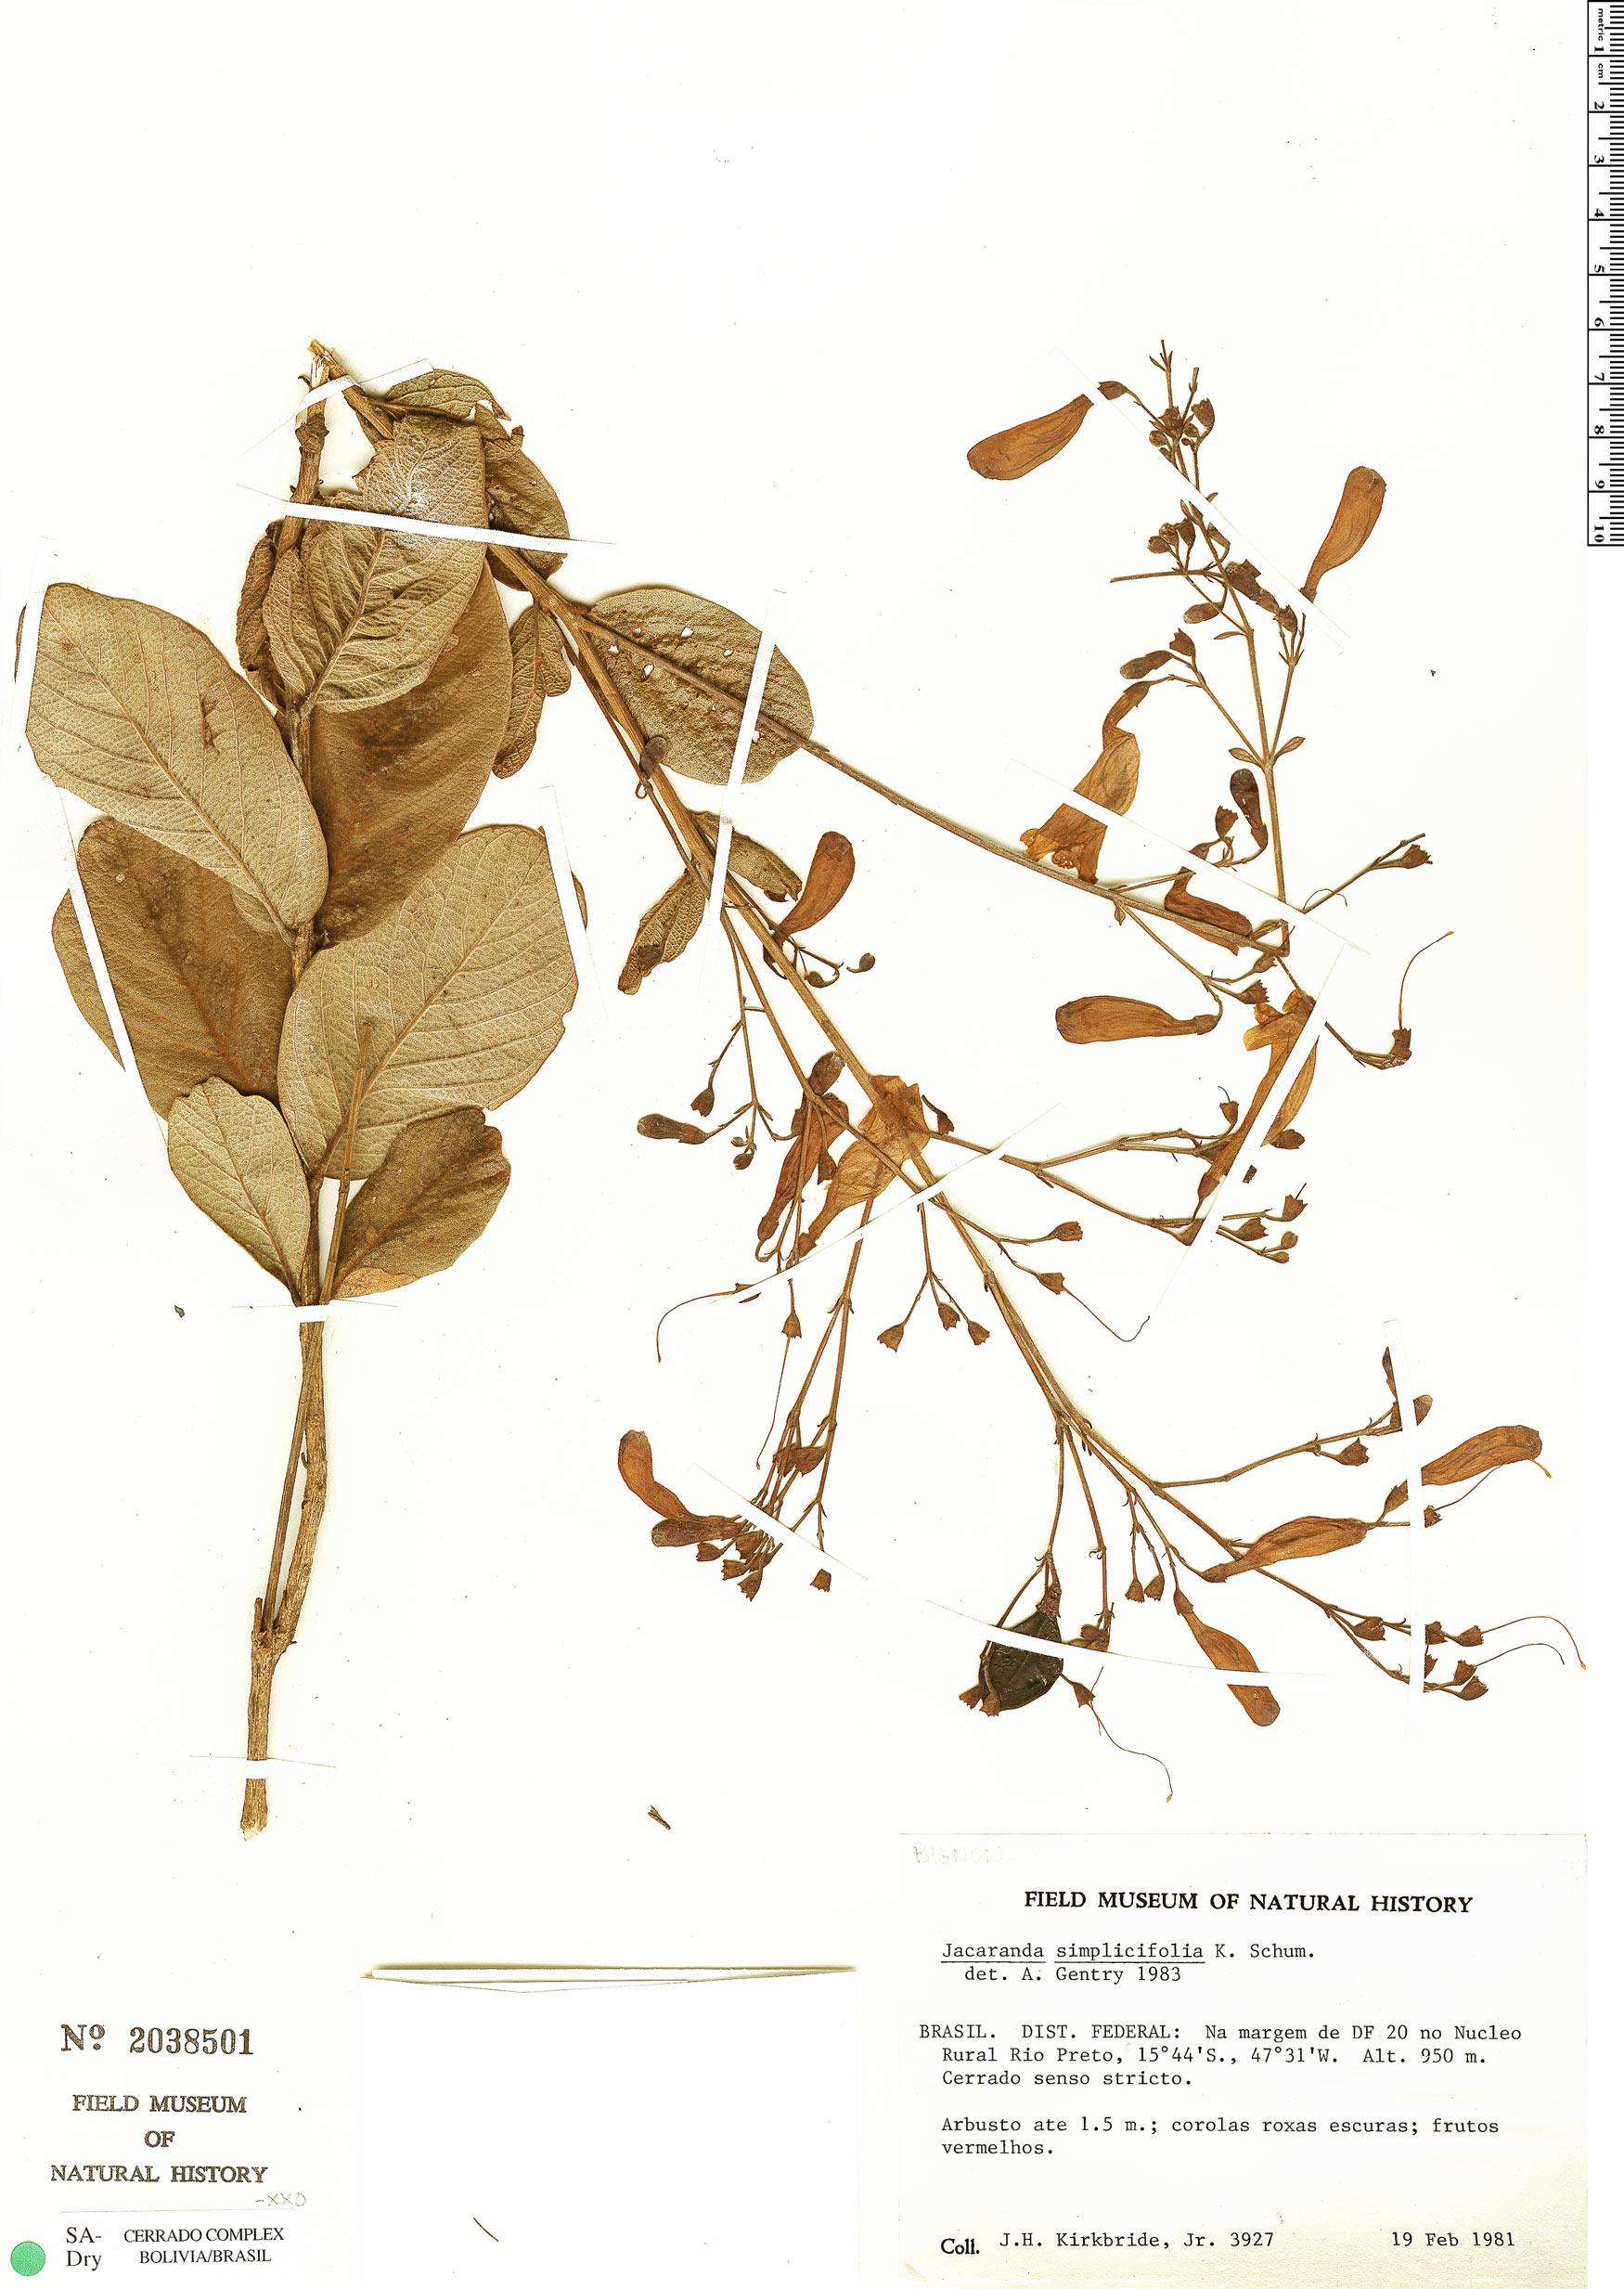 Specimen: Jacaranda simplicifolia